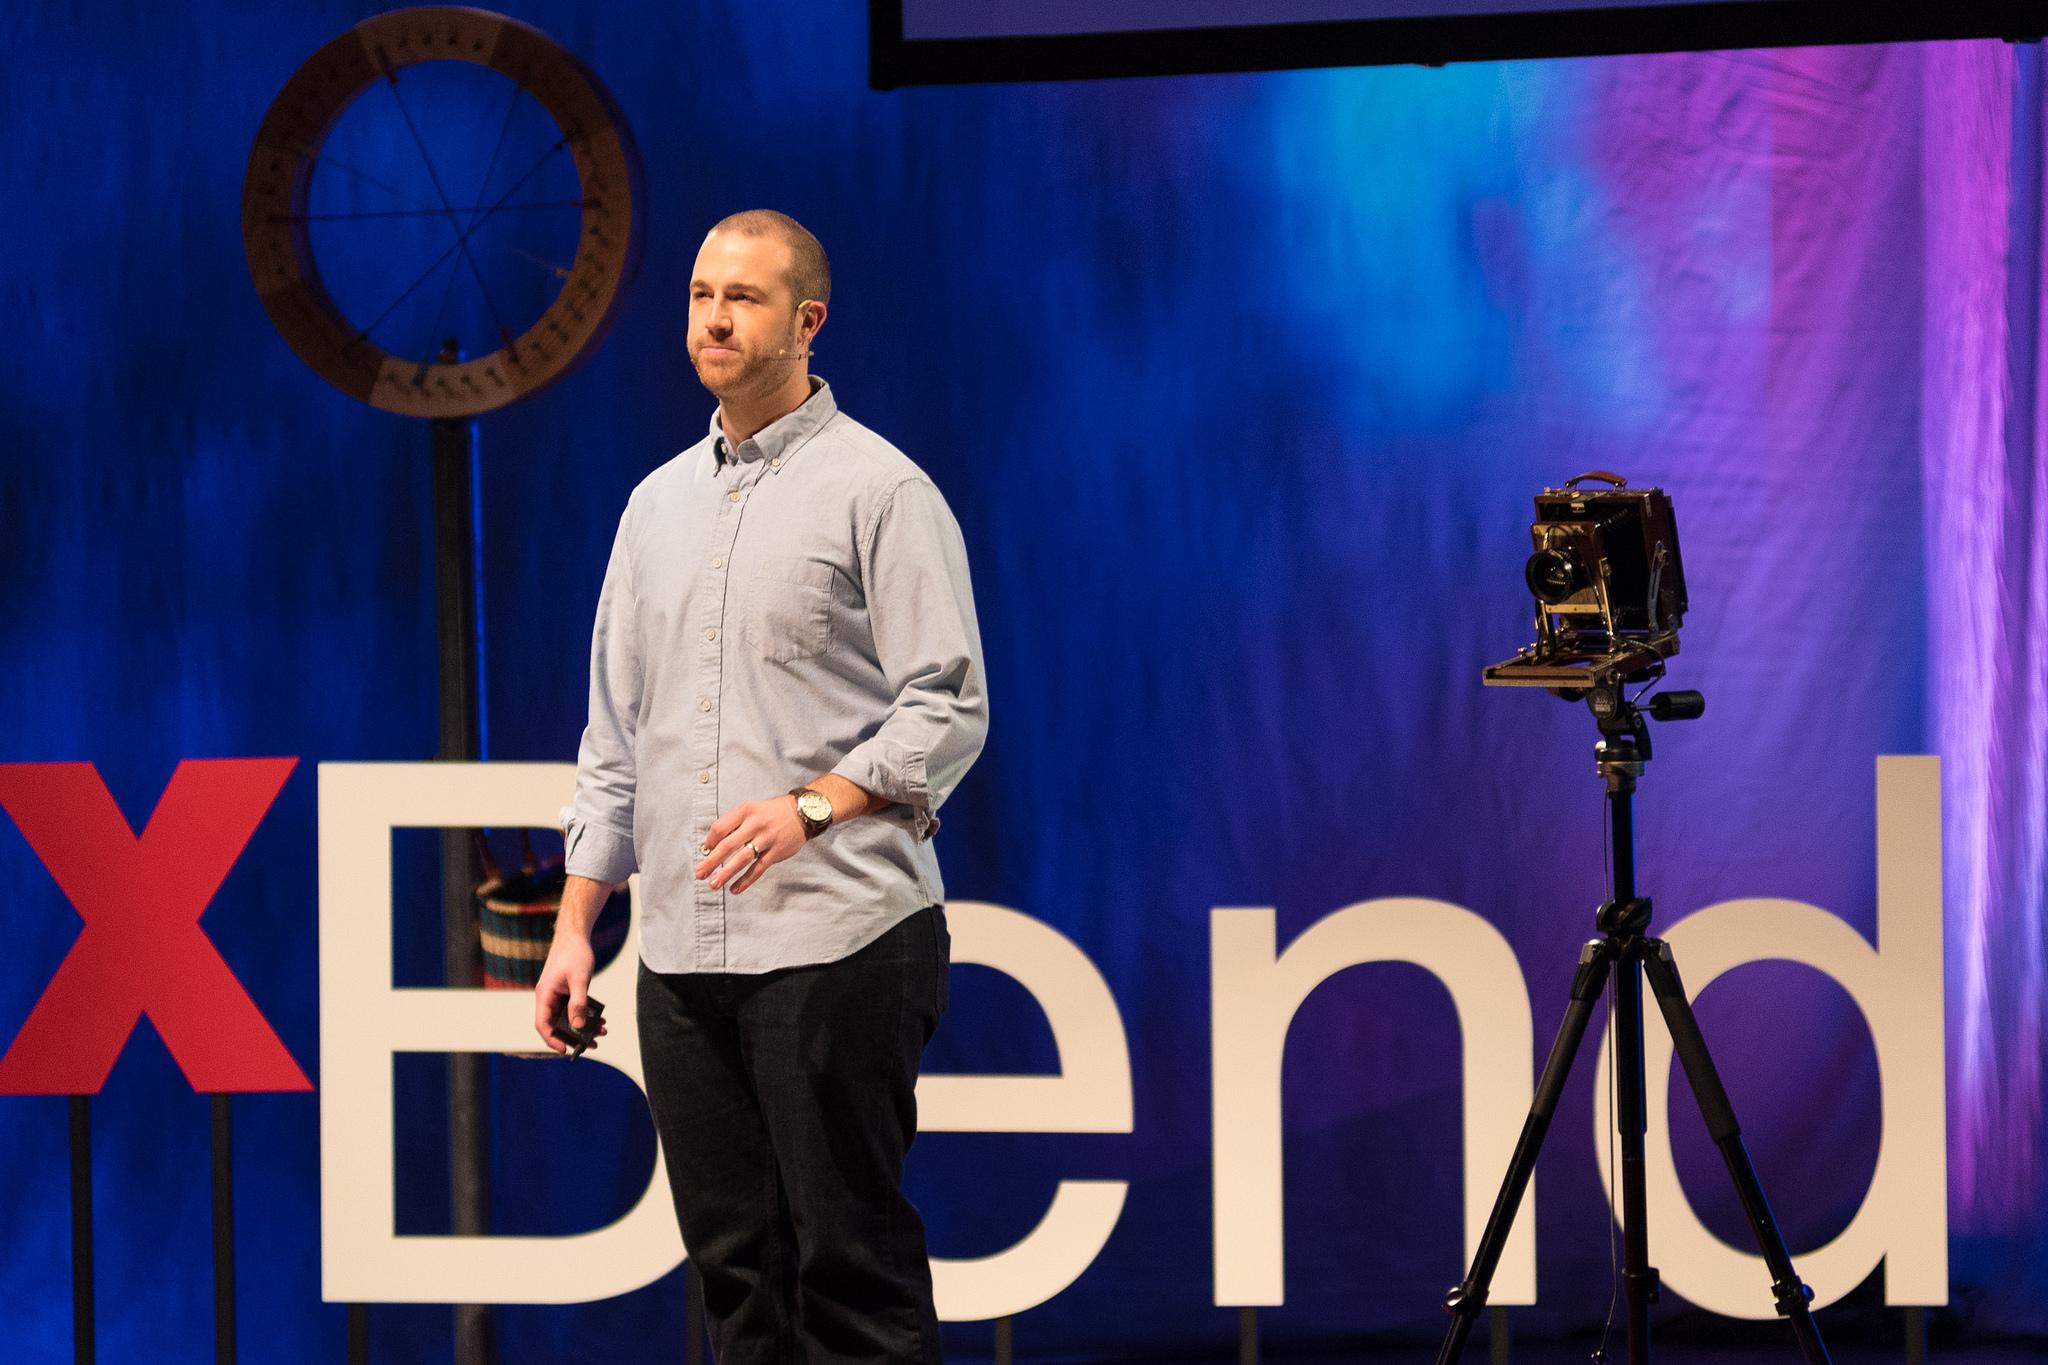 Eric Pickersgill Speaking at TEDxBend, 2016